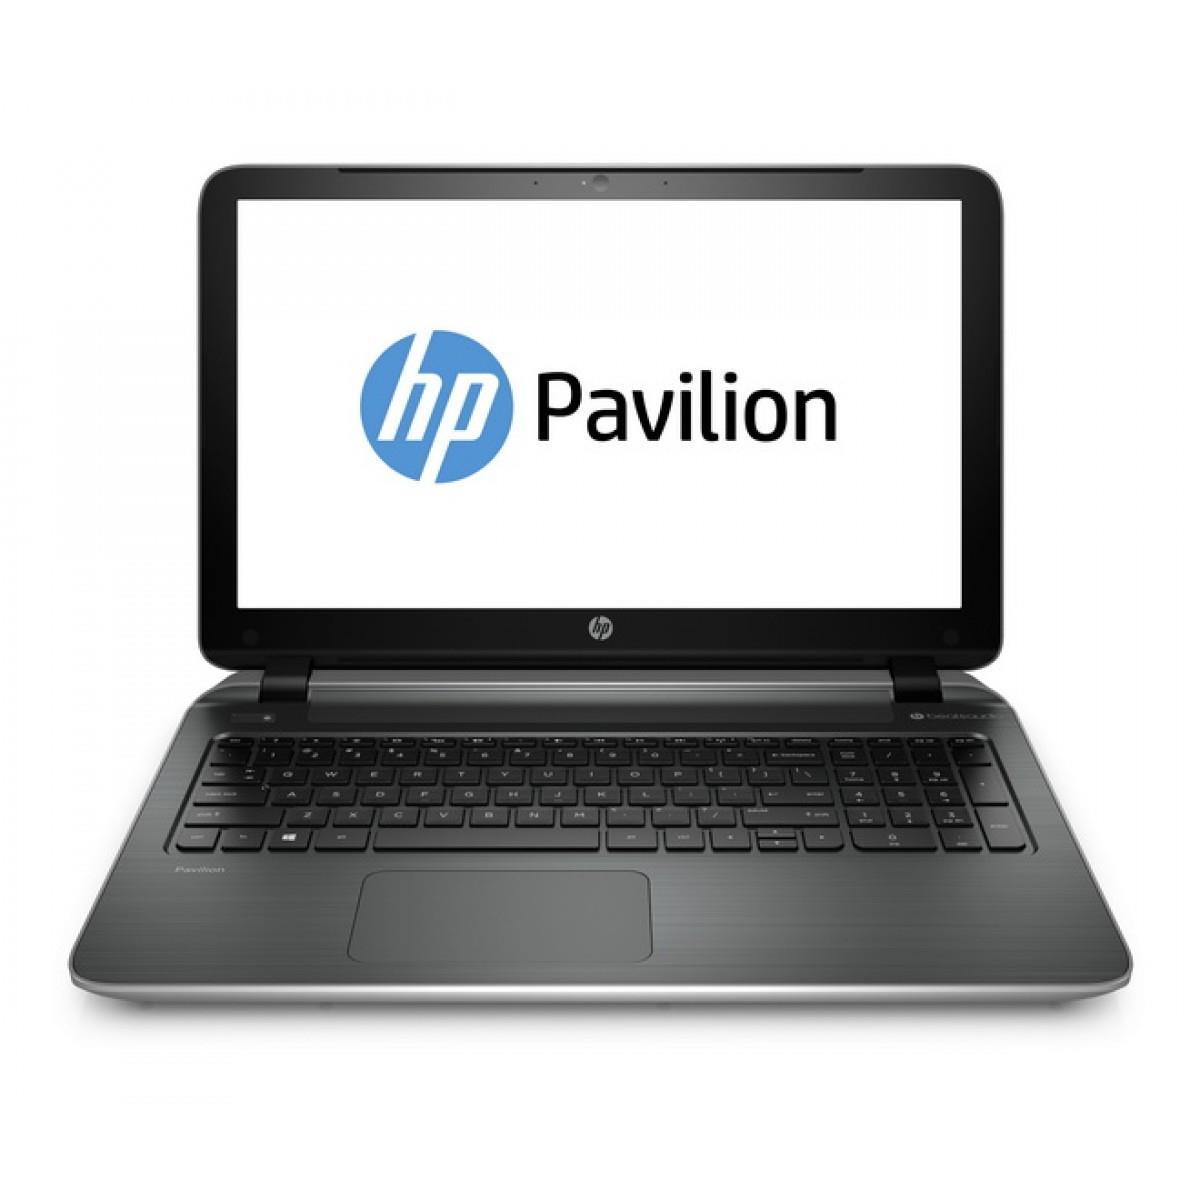 HP Pavilion 15 p018TU Laptop Image